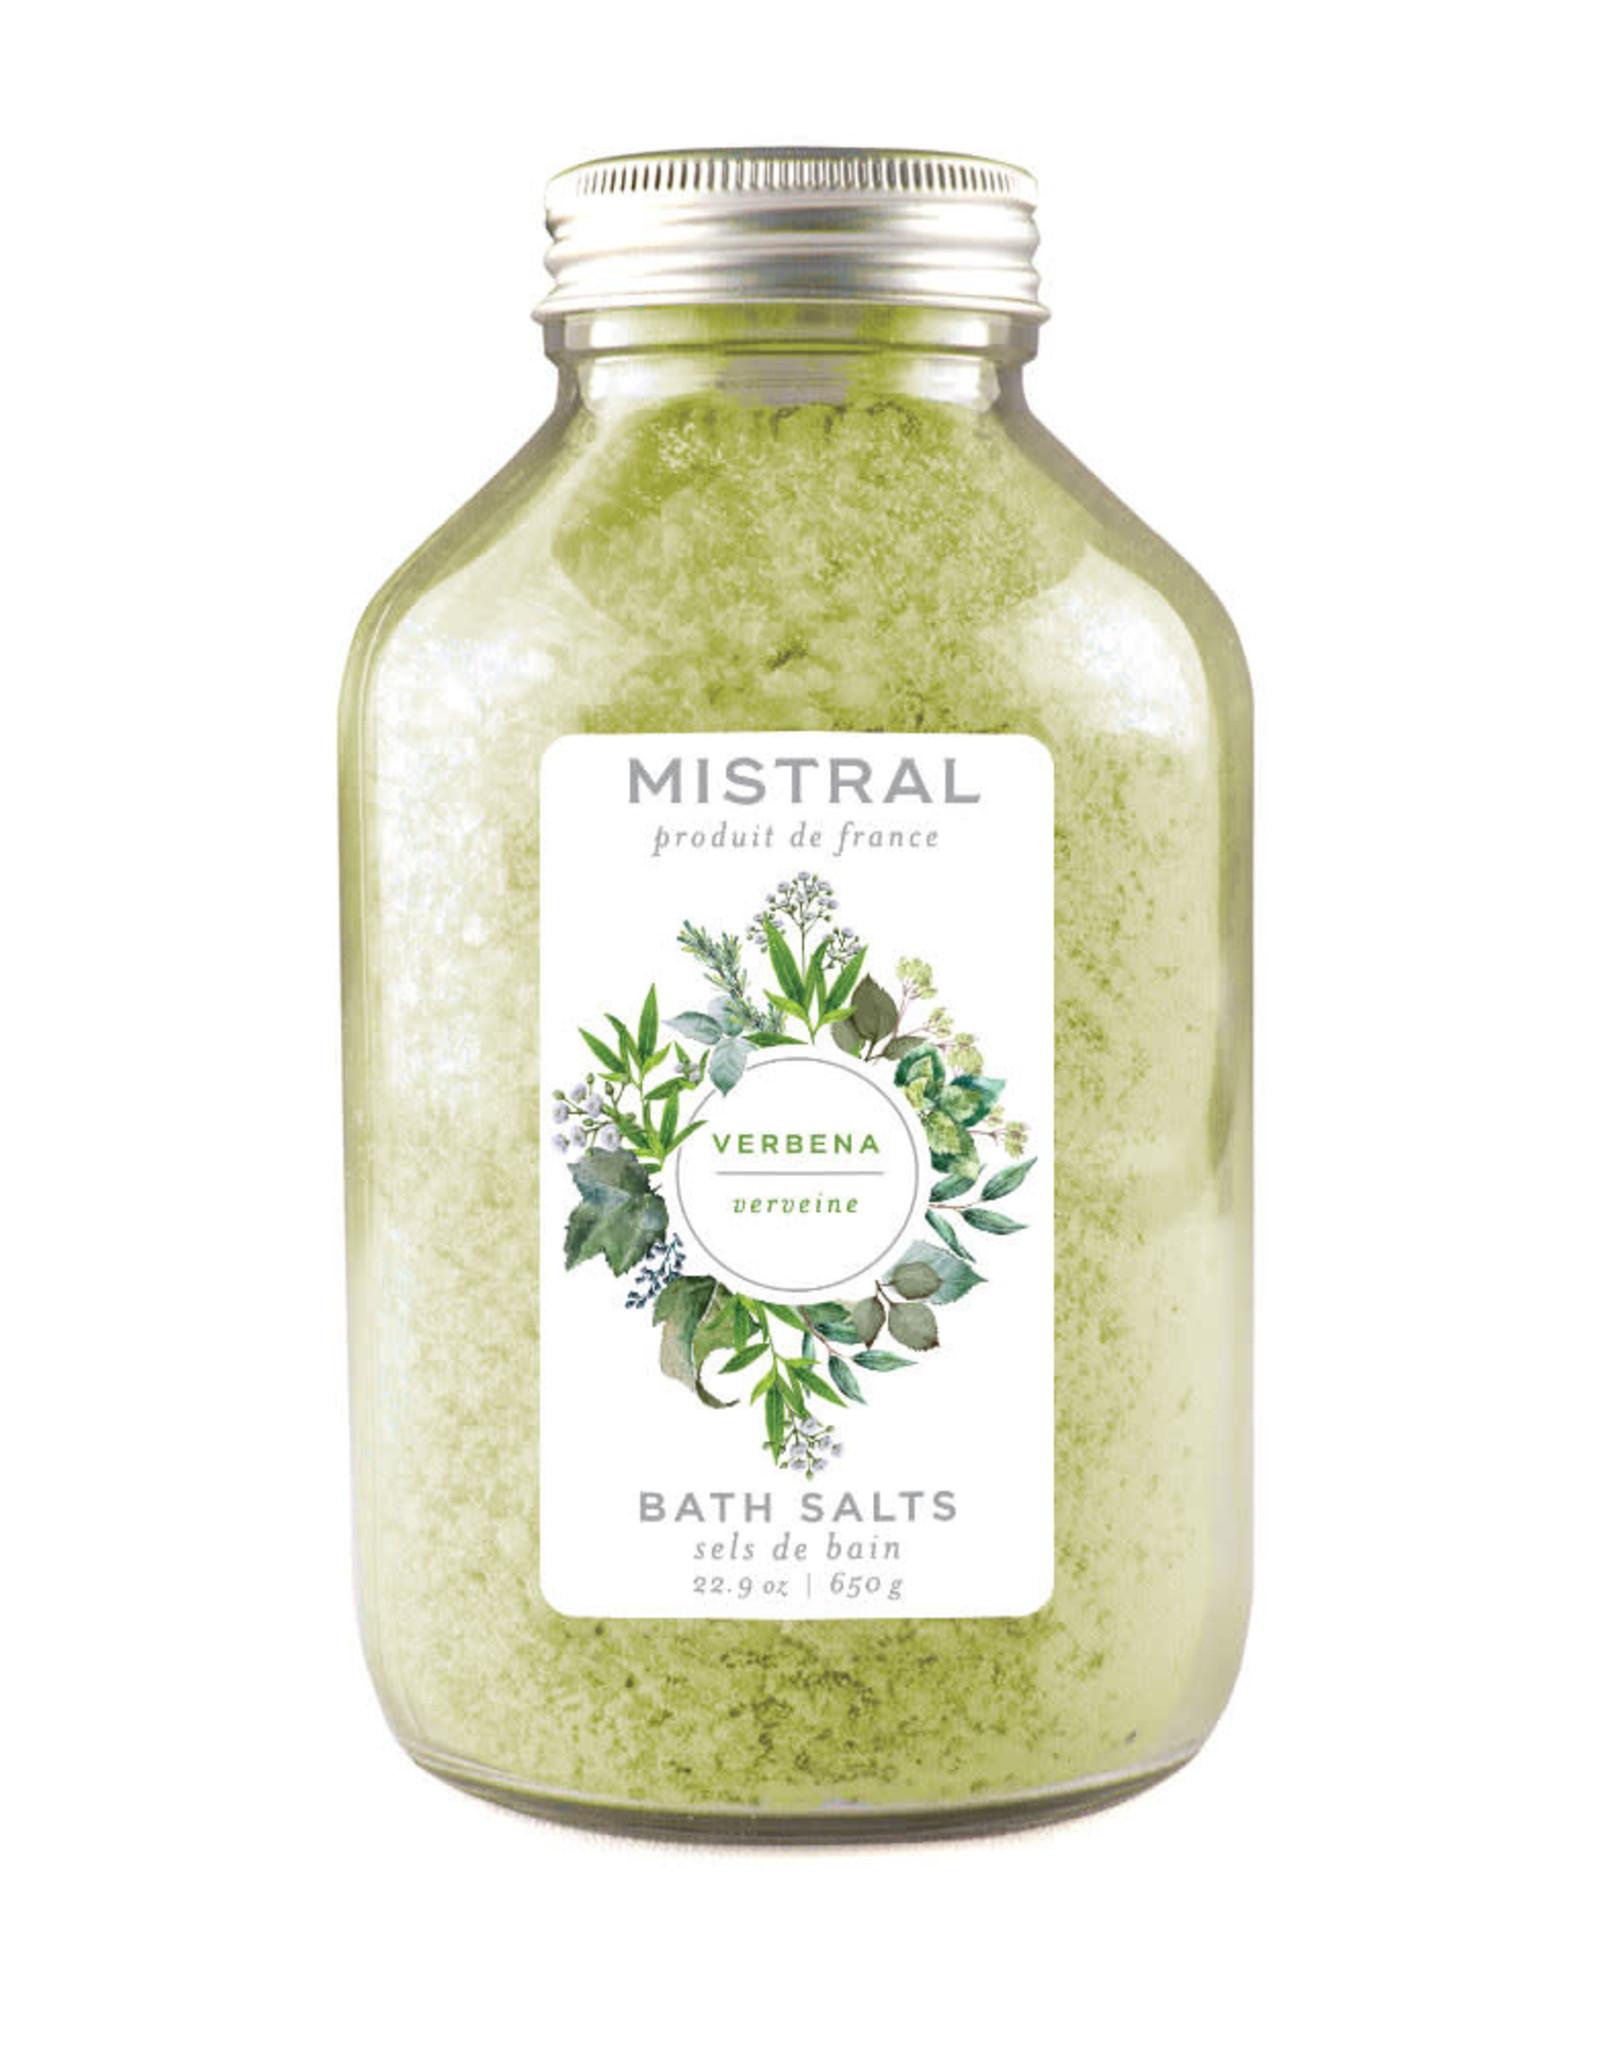 Verbena Bath Salts - 22.9 oz Glass Bottle - Mistral Classic Collection